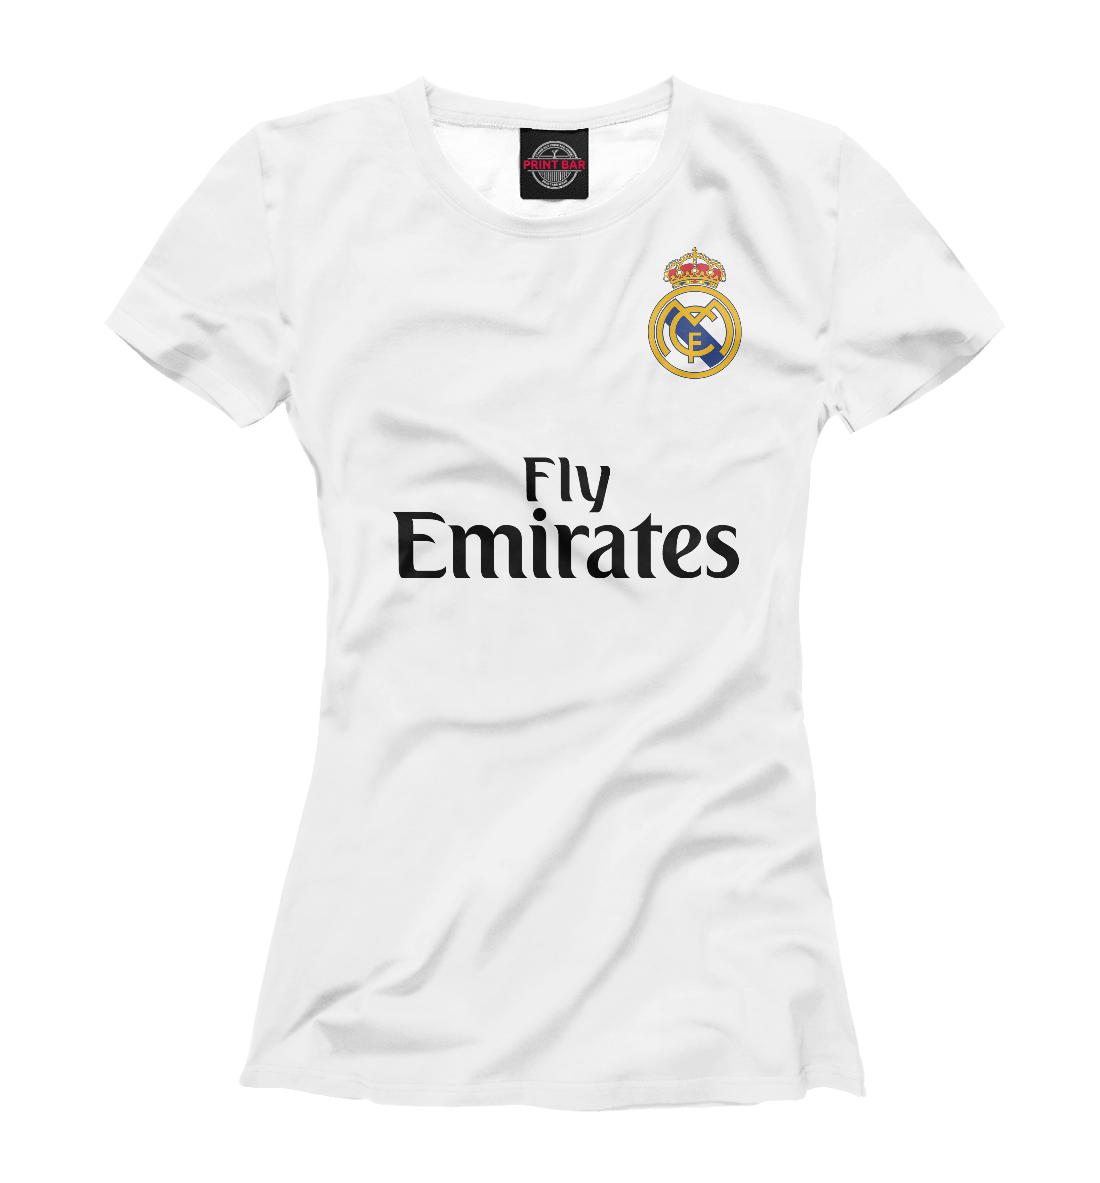 Купить Форма Реал Мадрид, Printbar, Футболки, REA-876584-fut-1